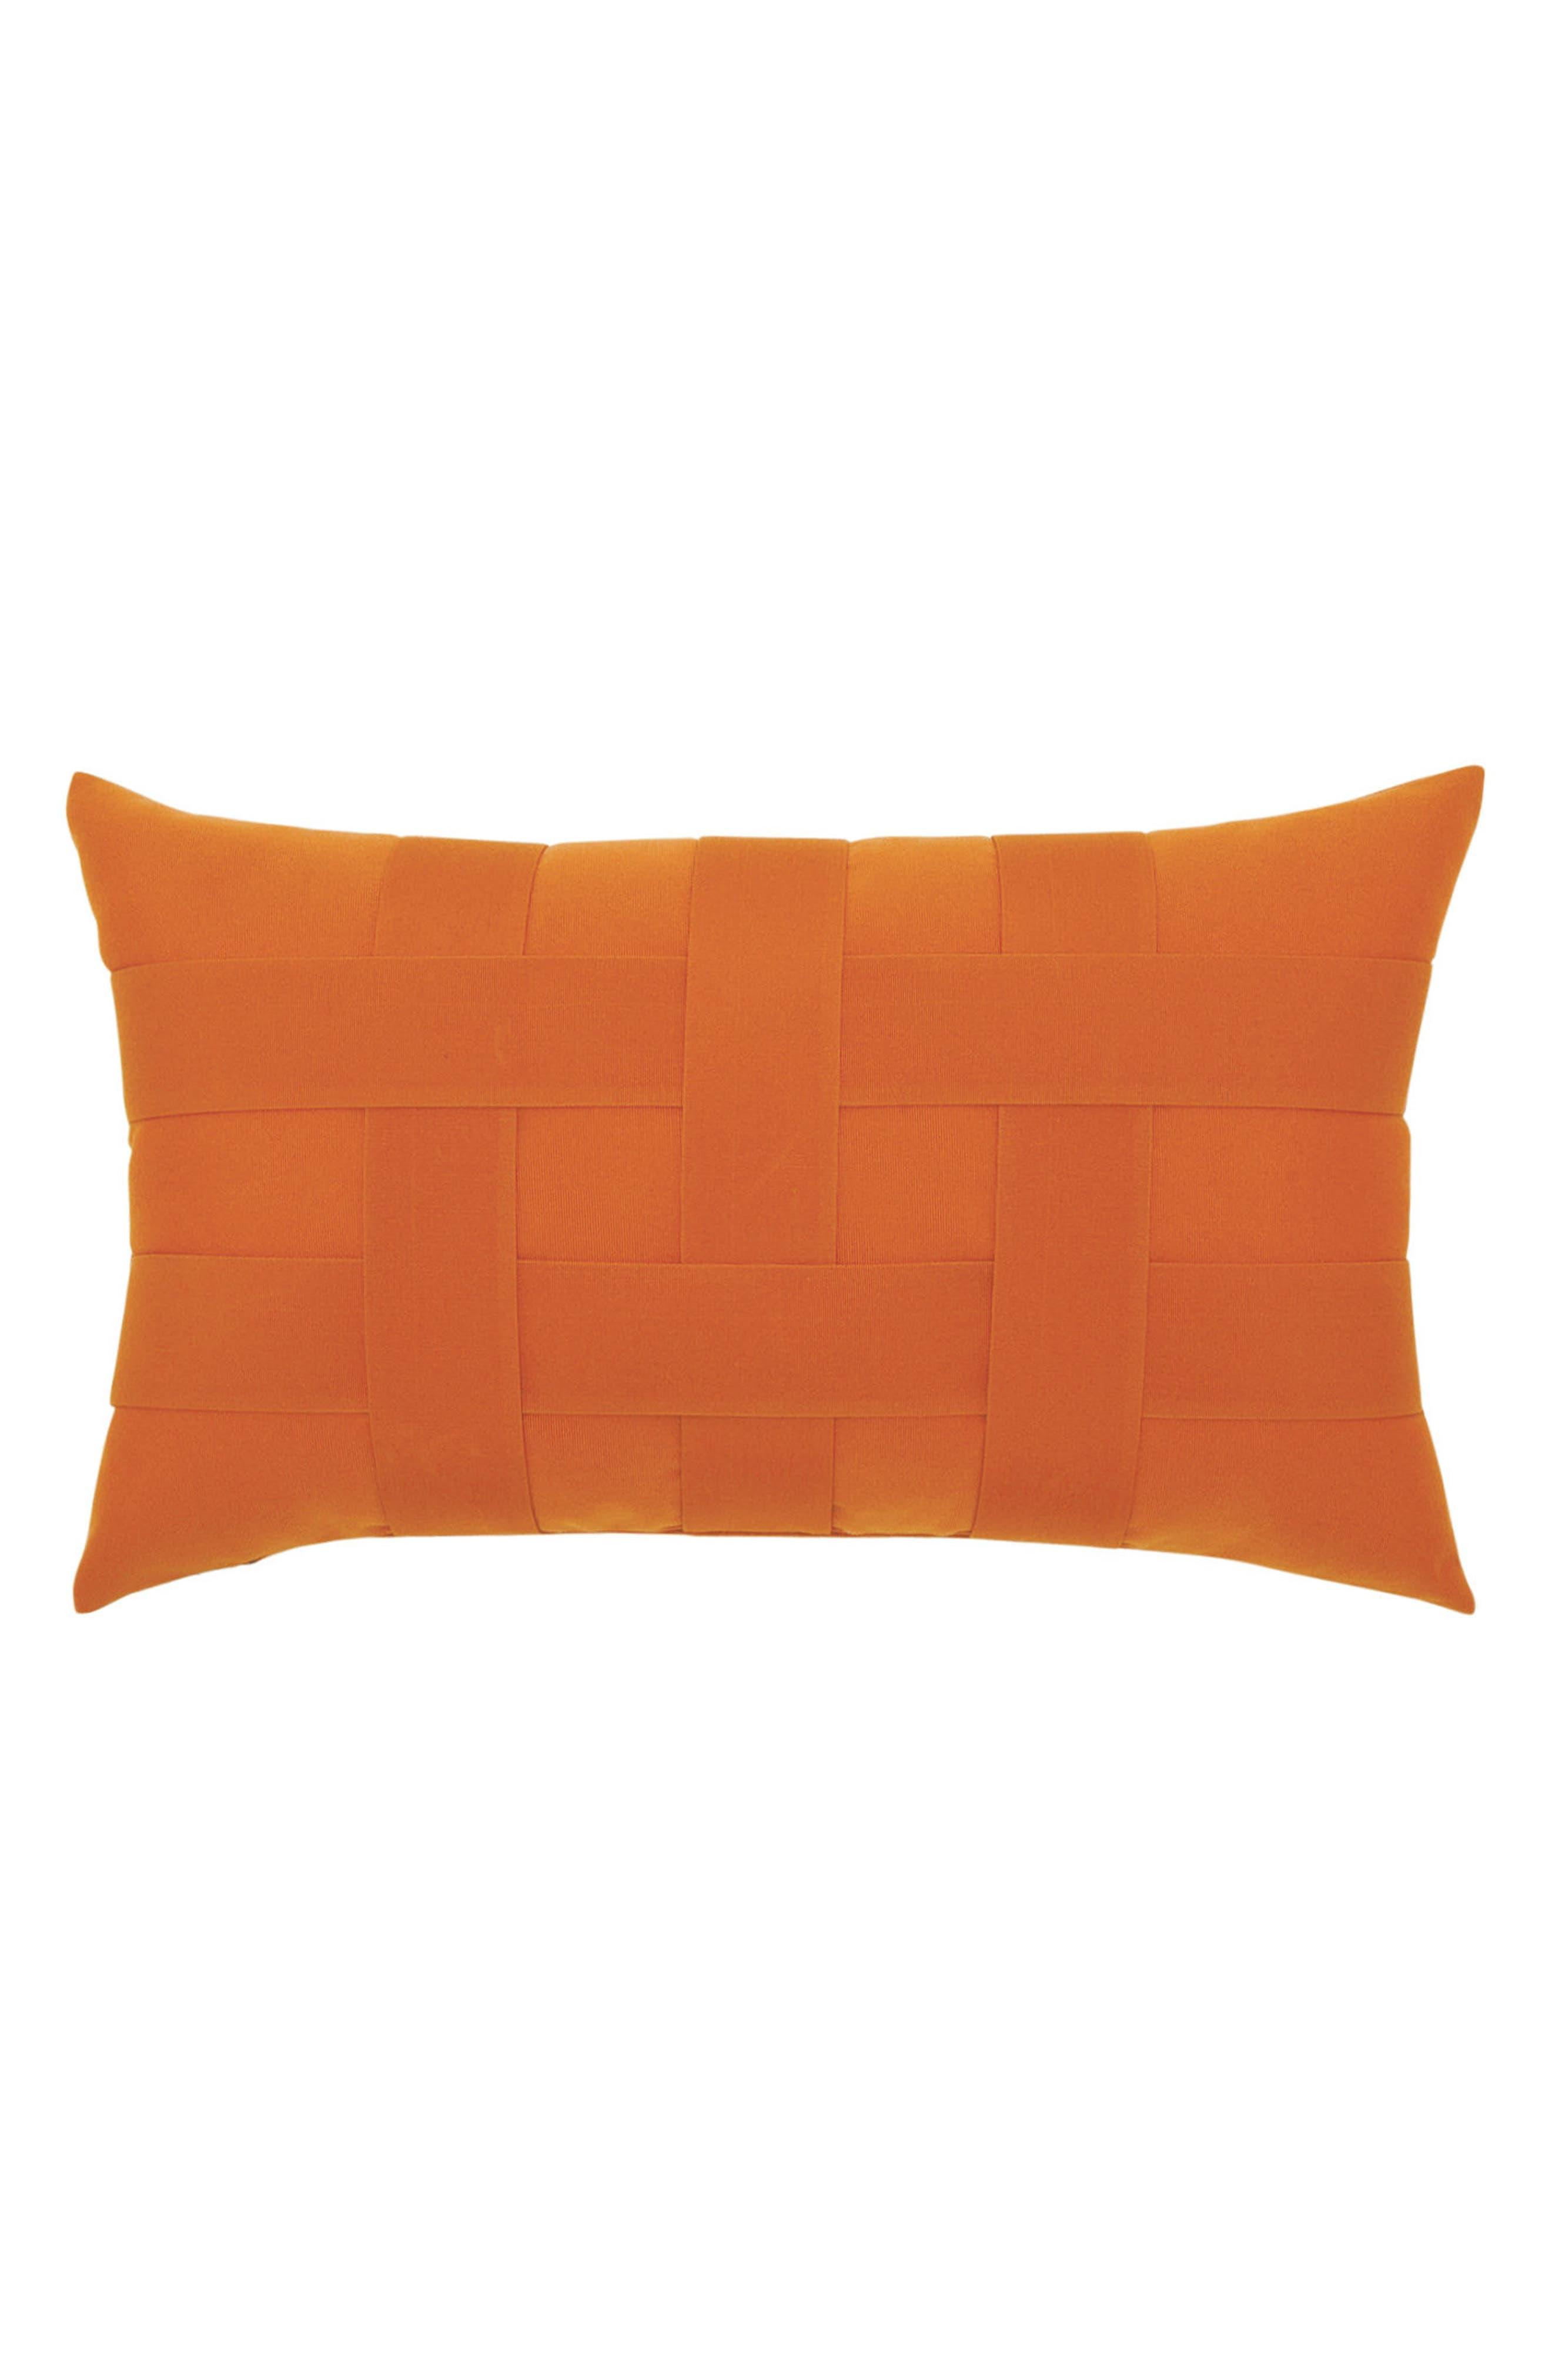 Basket Weave Indoor/Outdoor Accent Pillow,                             Main thumbnail 1, color,                             ORANGE